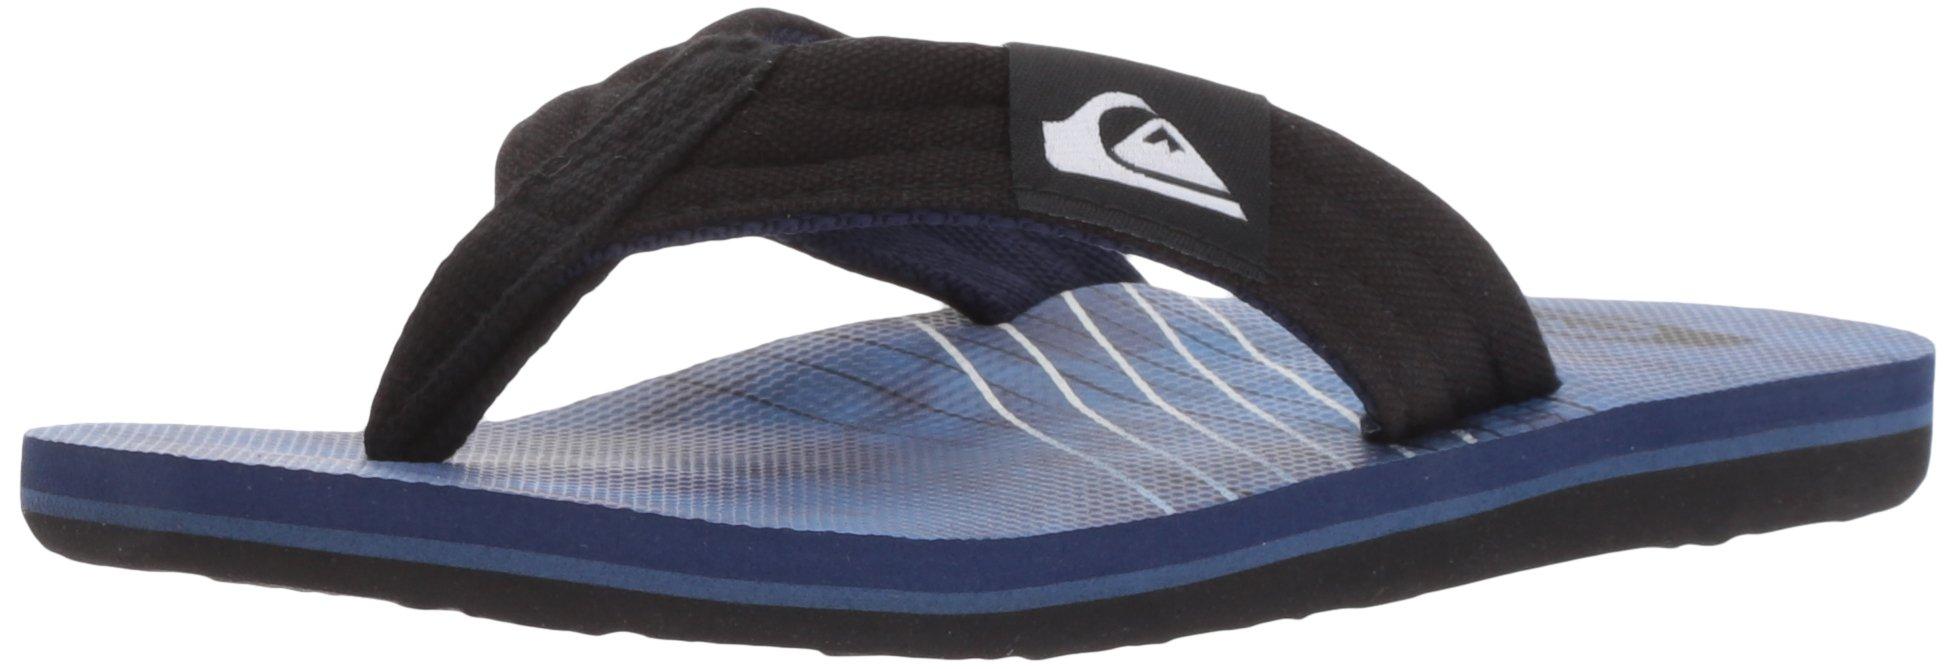 Quiksilver Boys' Molokai Layback Youth Sandal, Black/Blue/Blue, 6 M US Big Kid